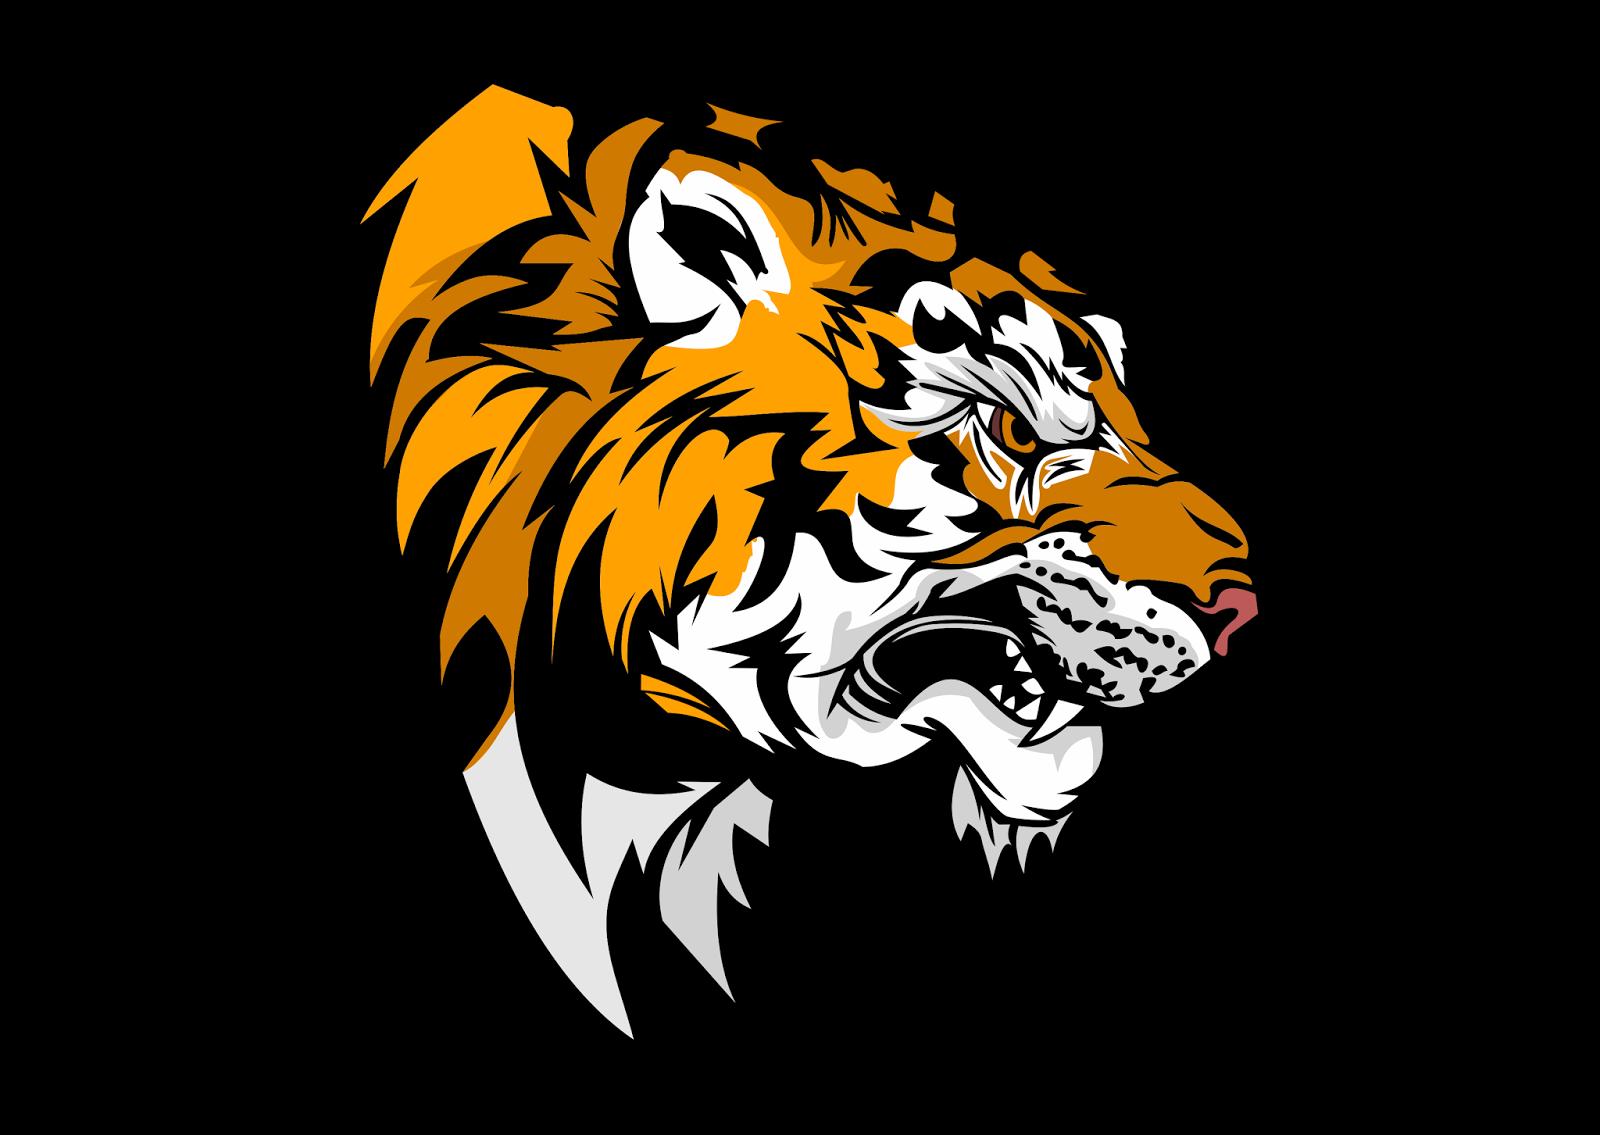 tiger head logo - HD1600×1135